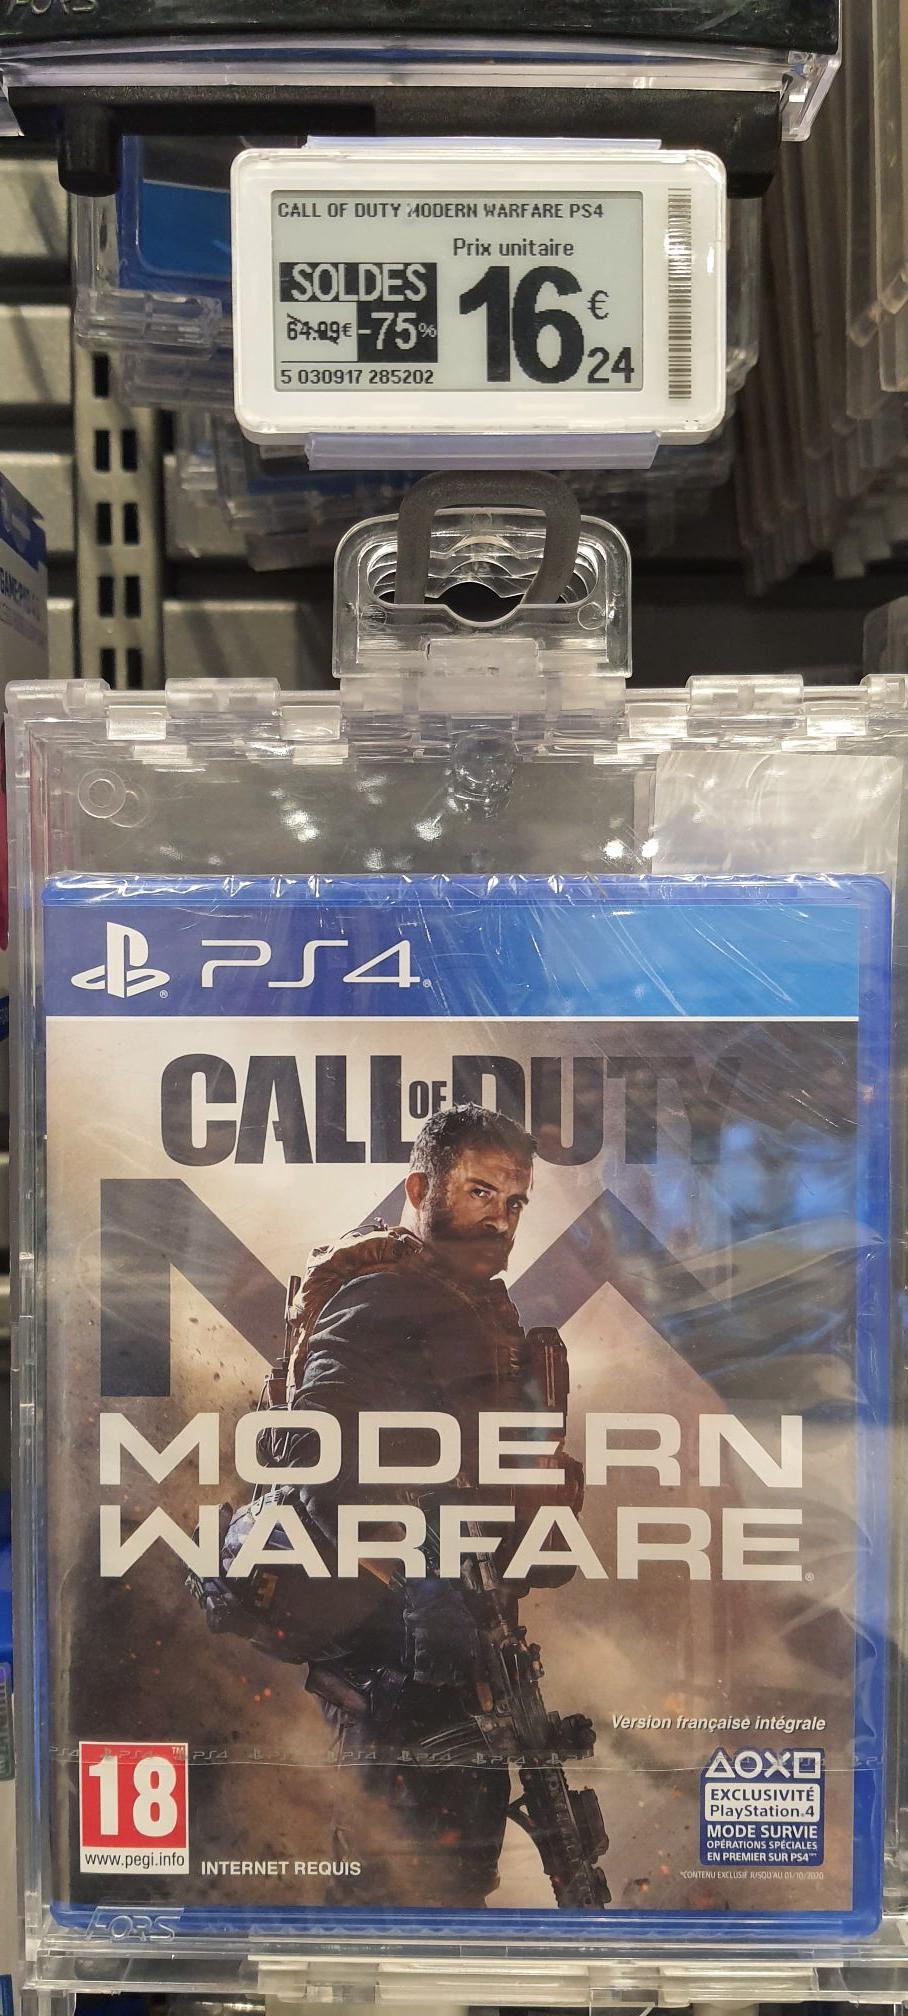 Call of Duty Modern Warfare sur PS4 - Frouard (54)